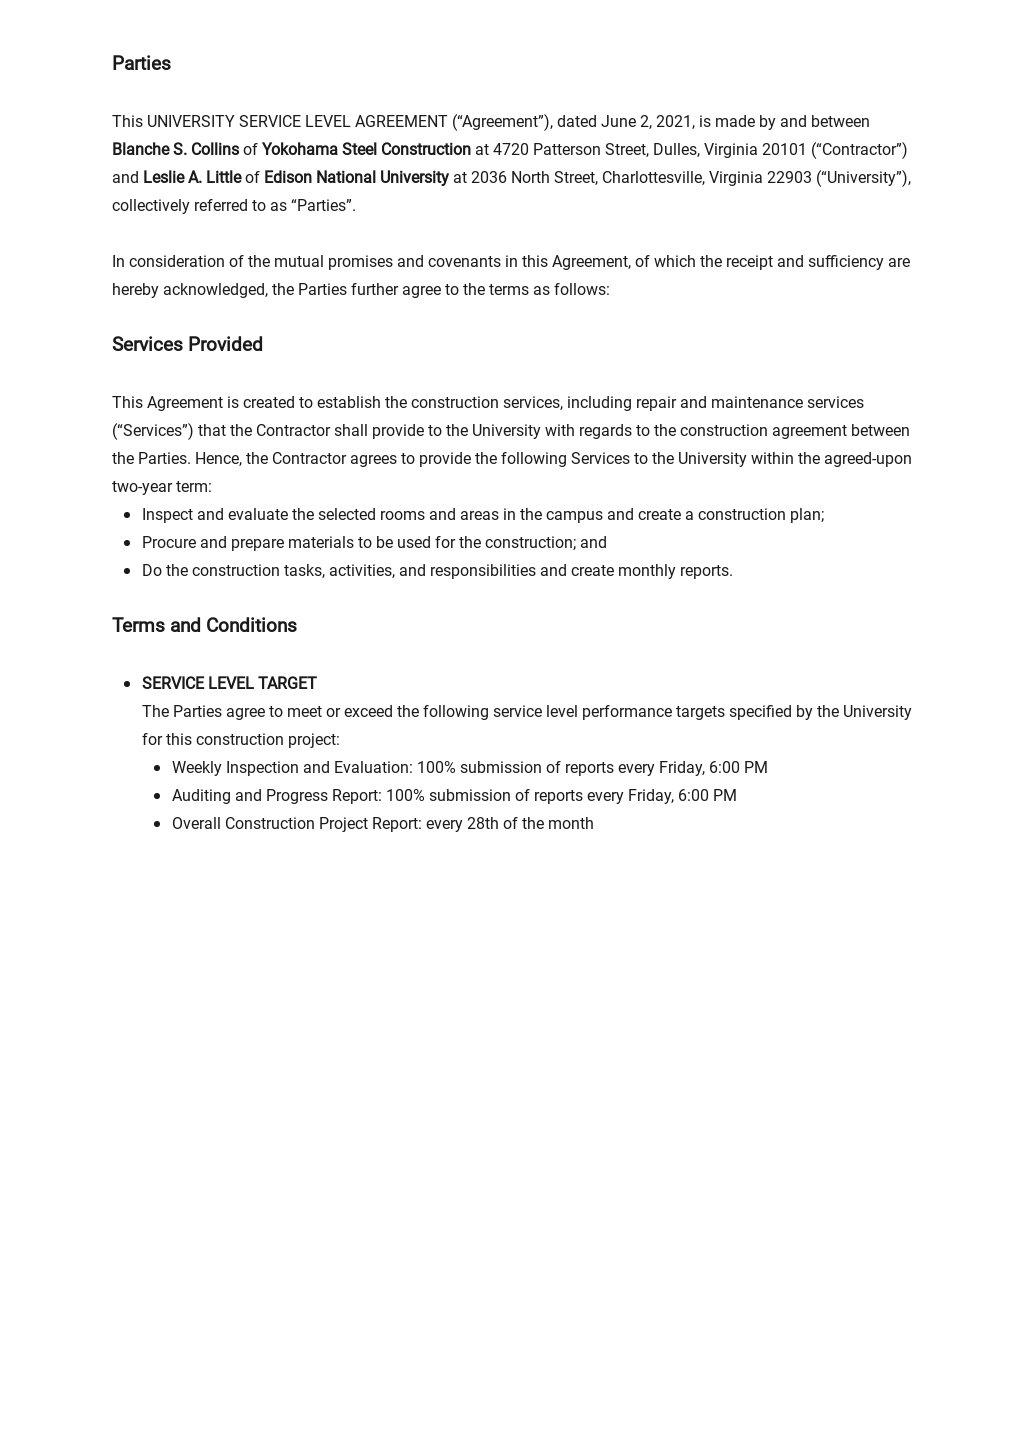 University Service Level Agreement Template 1.jpe